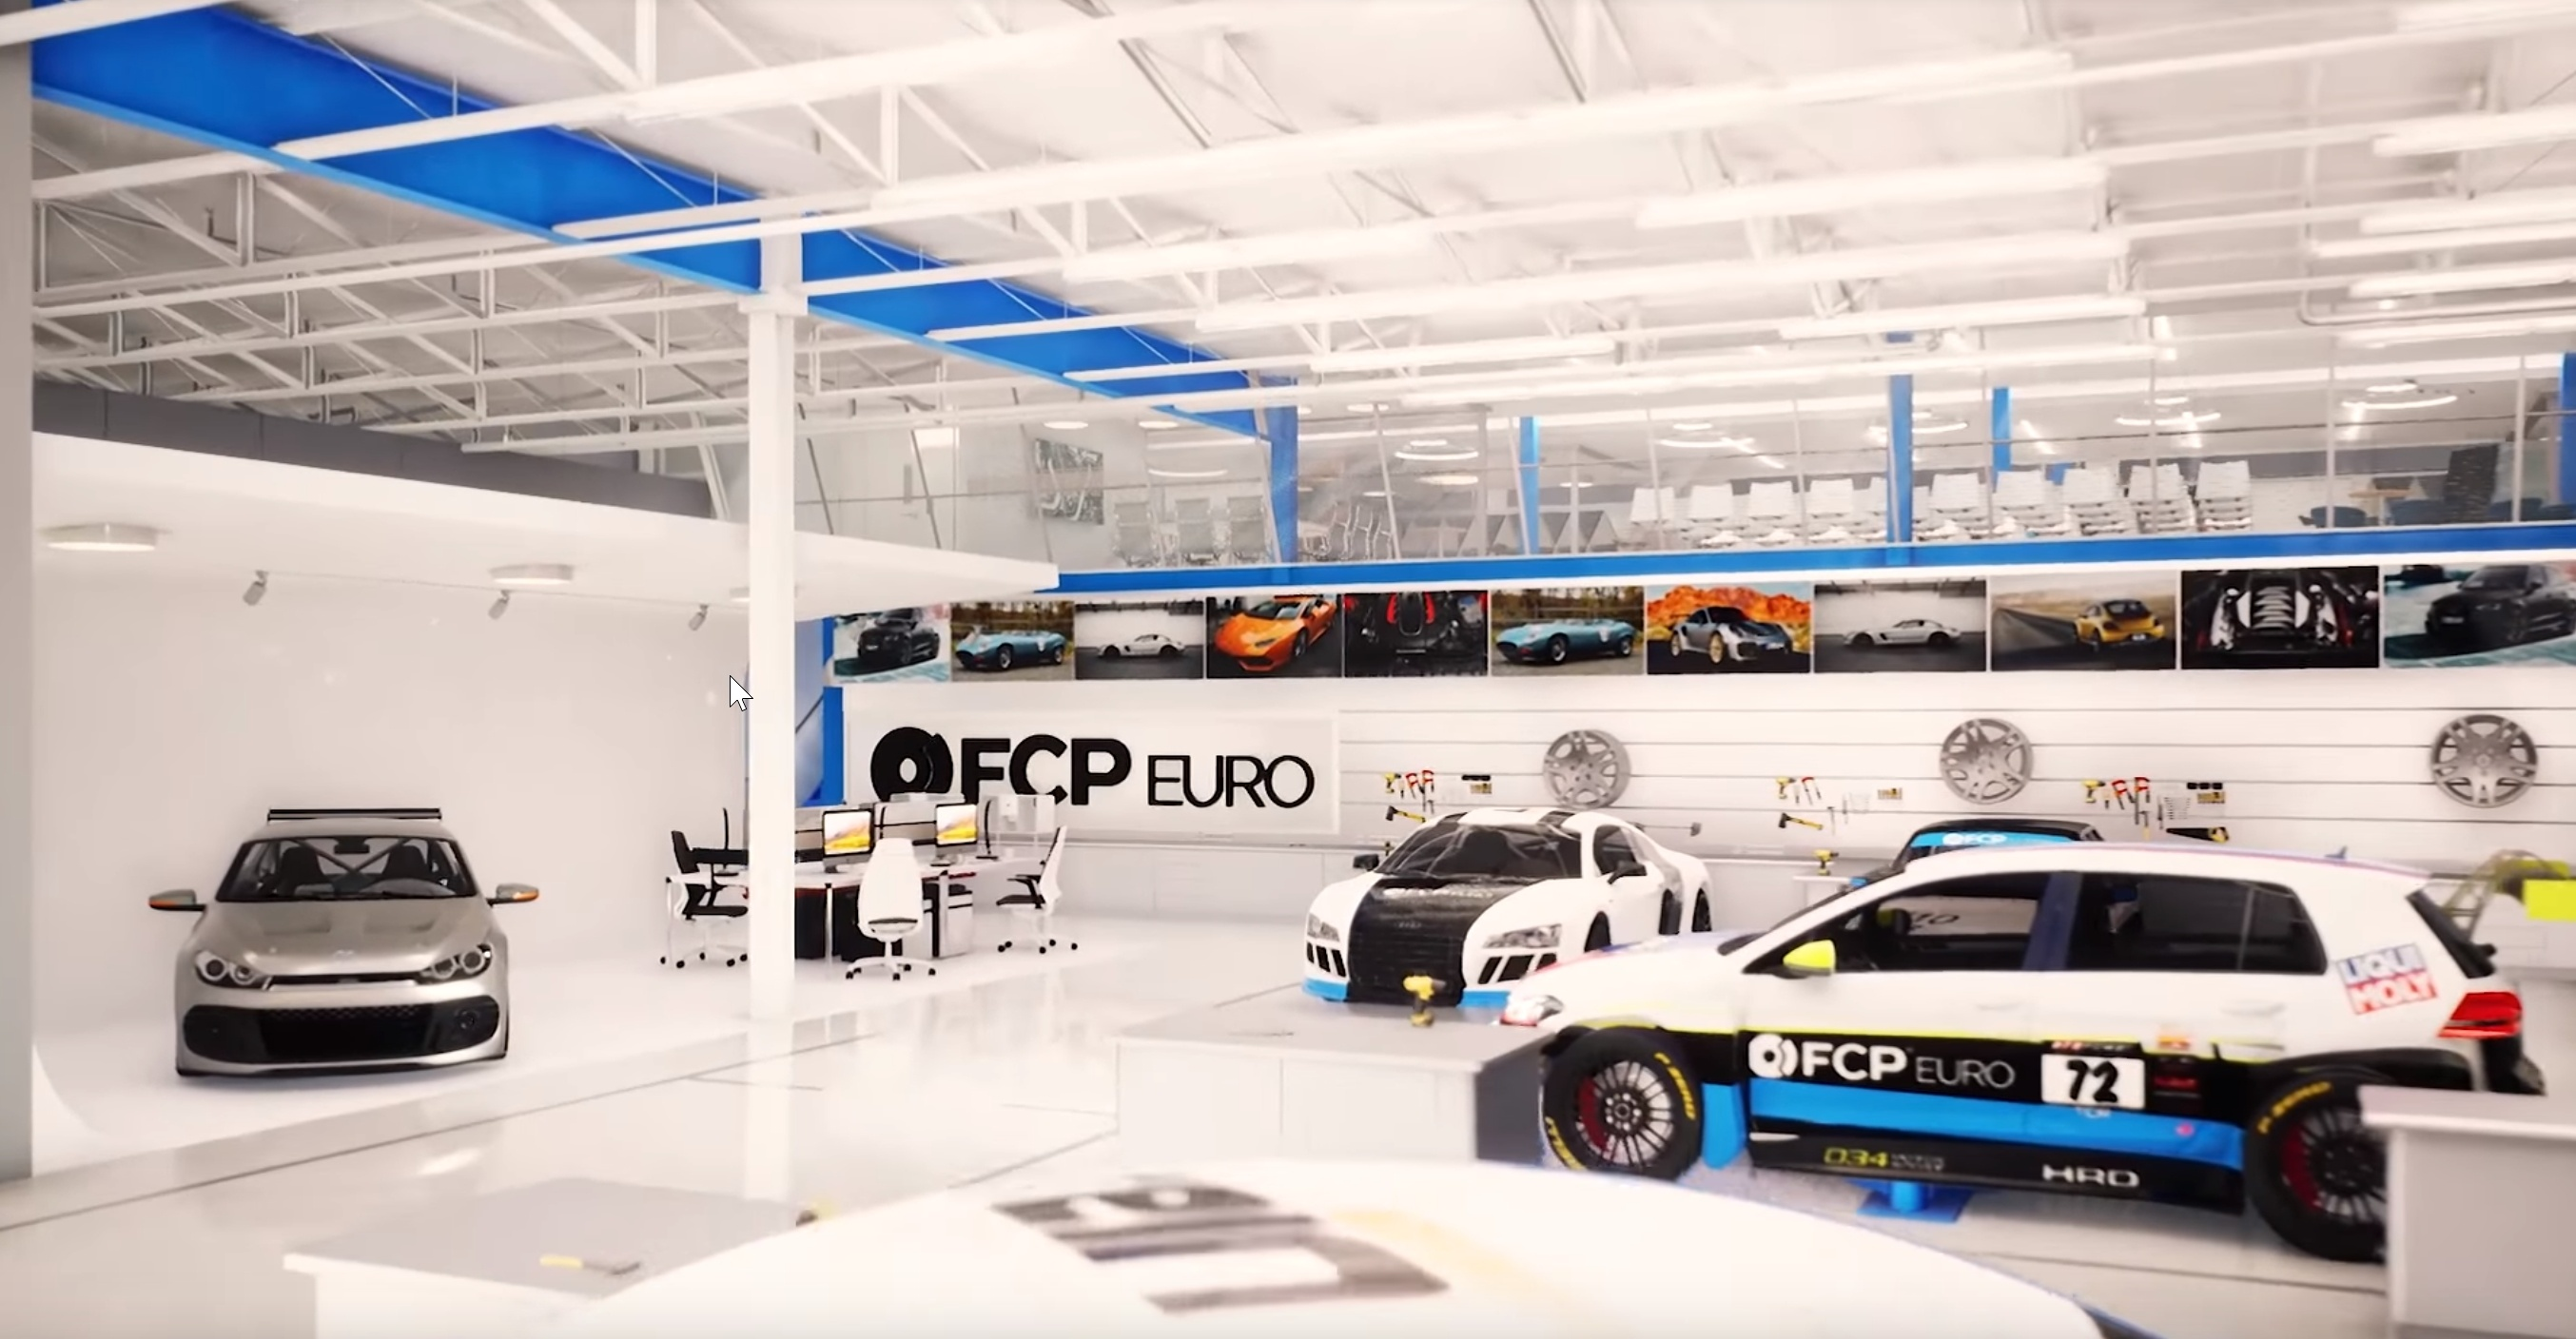 fcp-euro-expansion-motorsports-studio-2